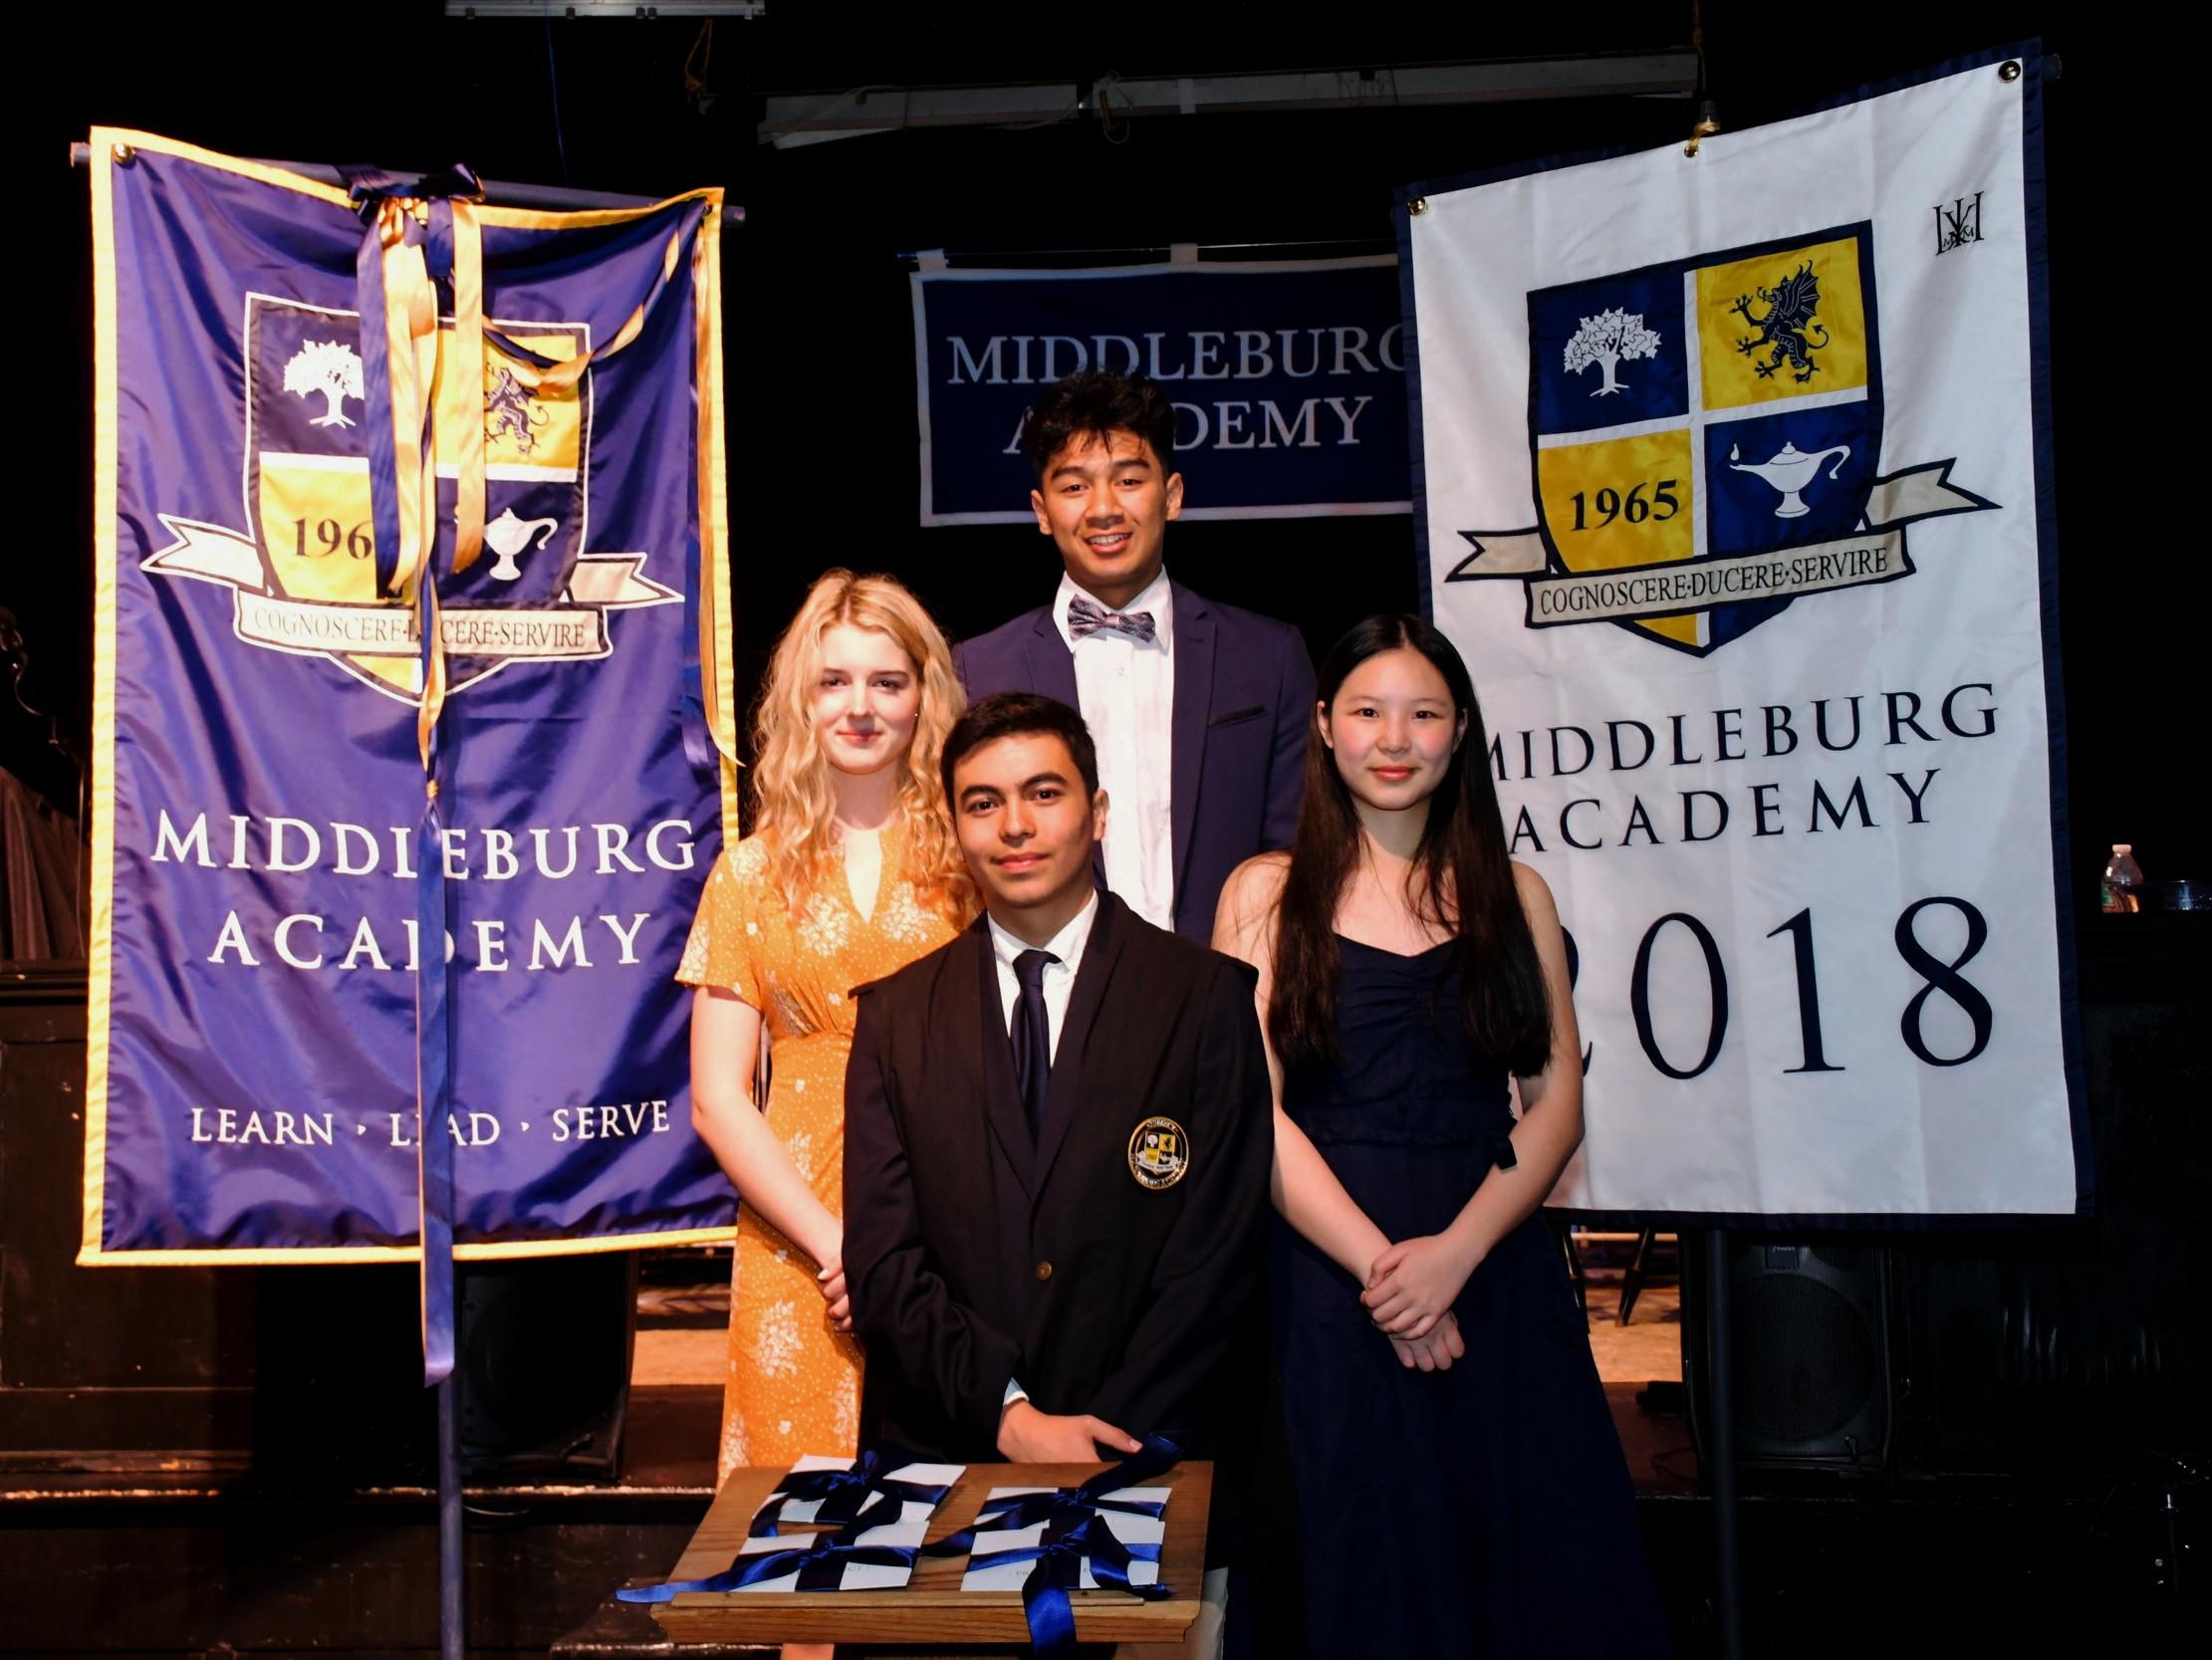 The Prefects: Lana Bennett, Master Prefect; Axel Arellano Head Prefect; David Penney, Sergeant-at-Arms; Coco Chen, Secretary